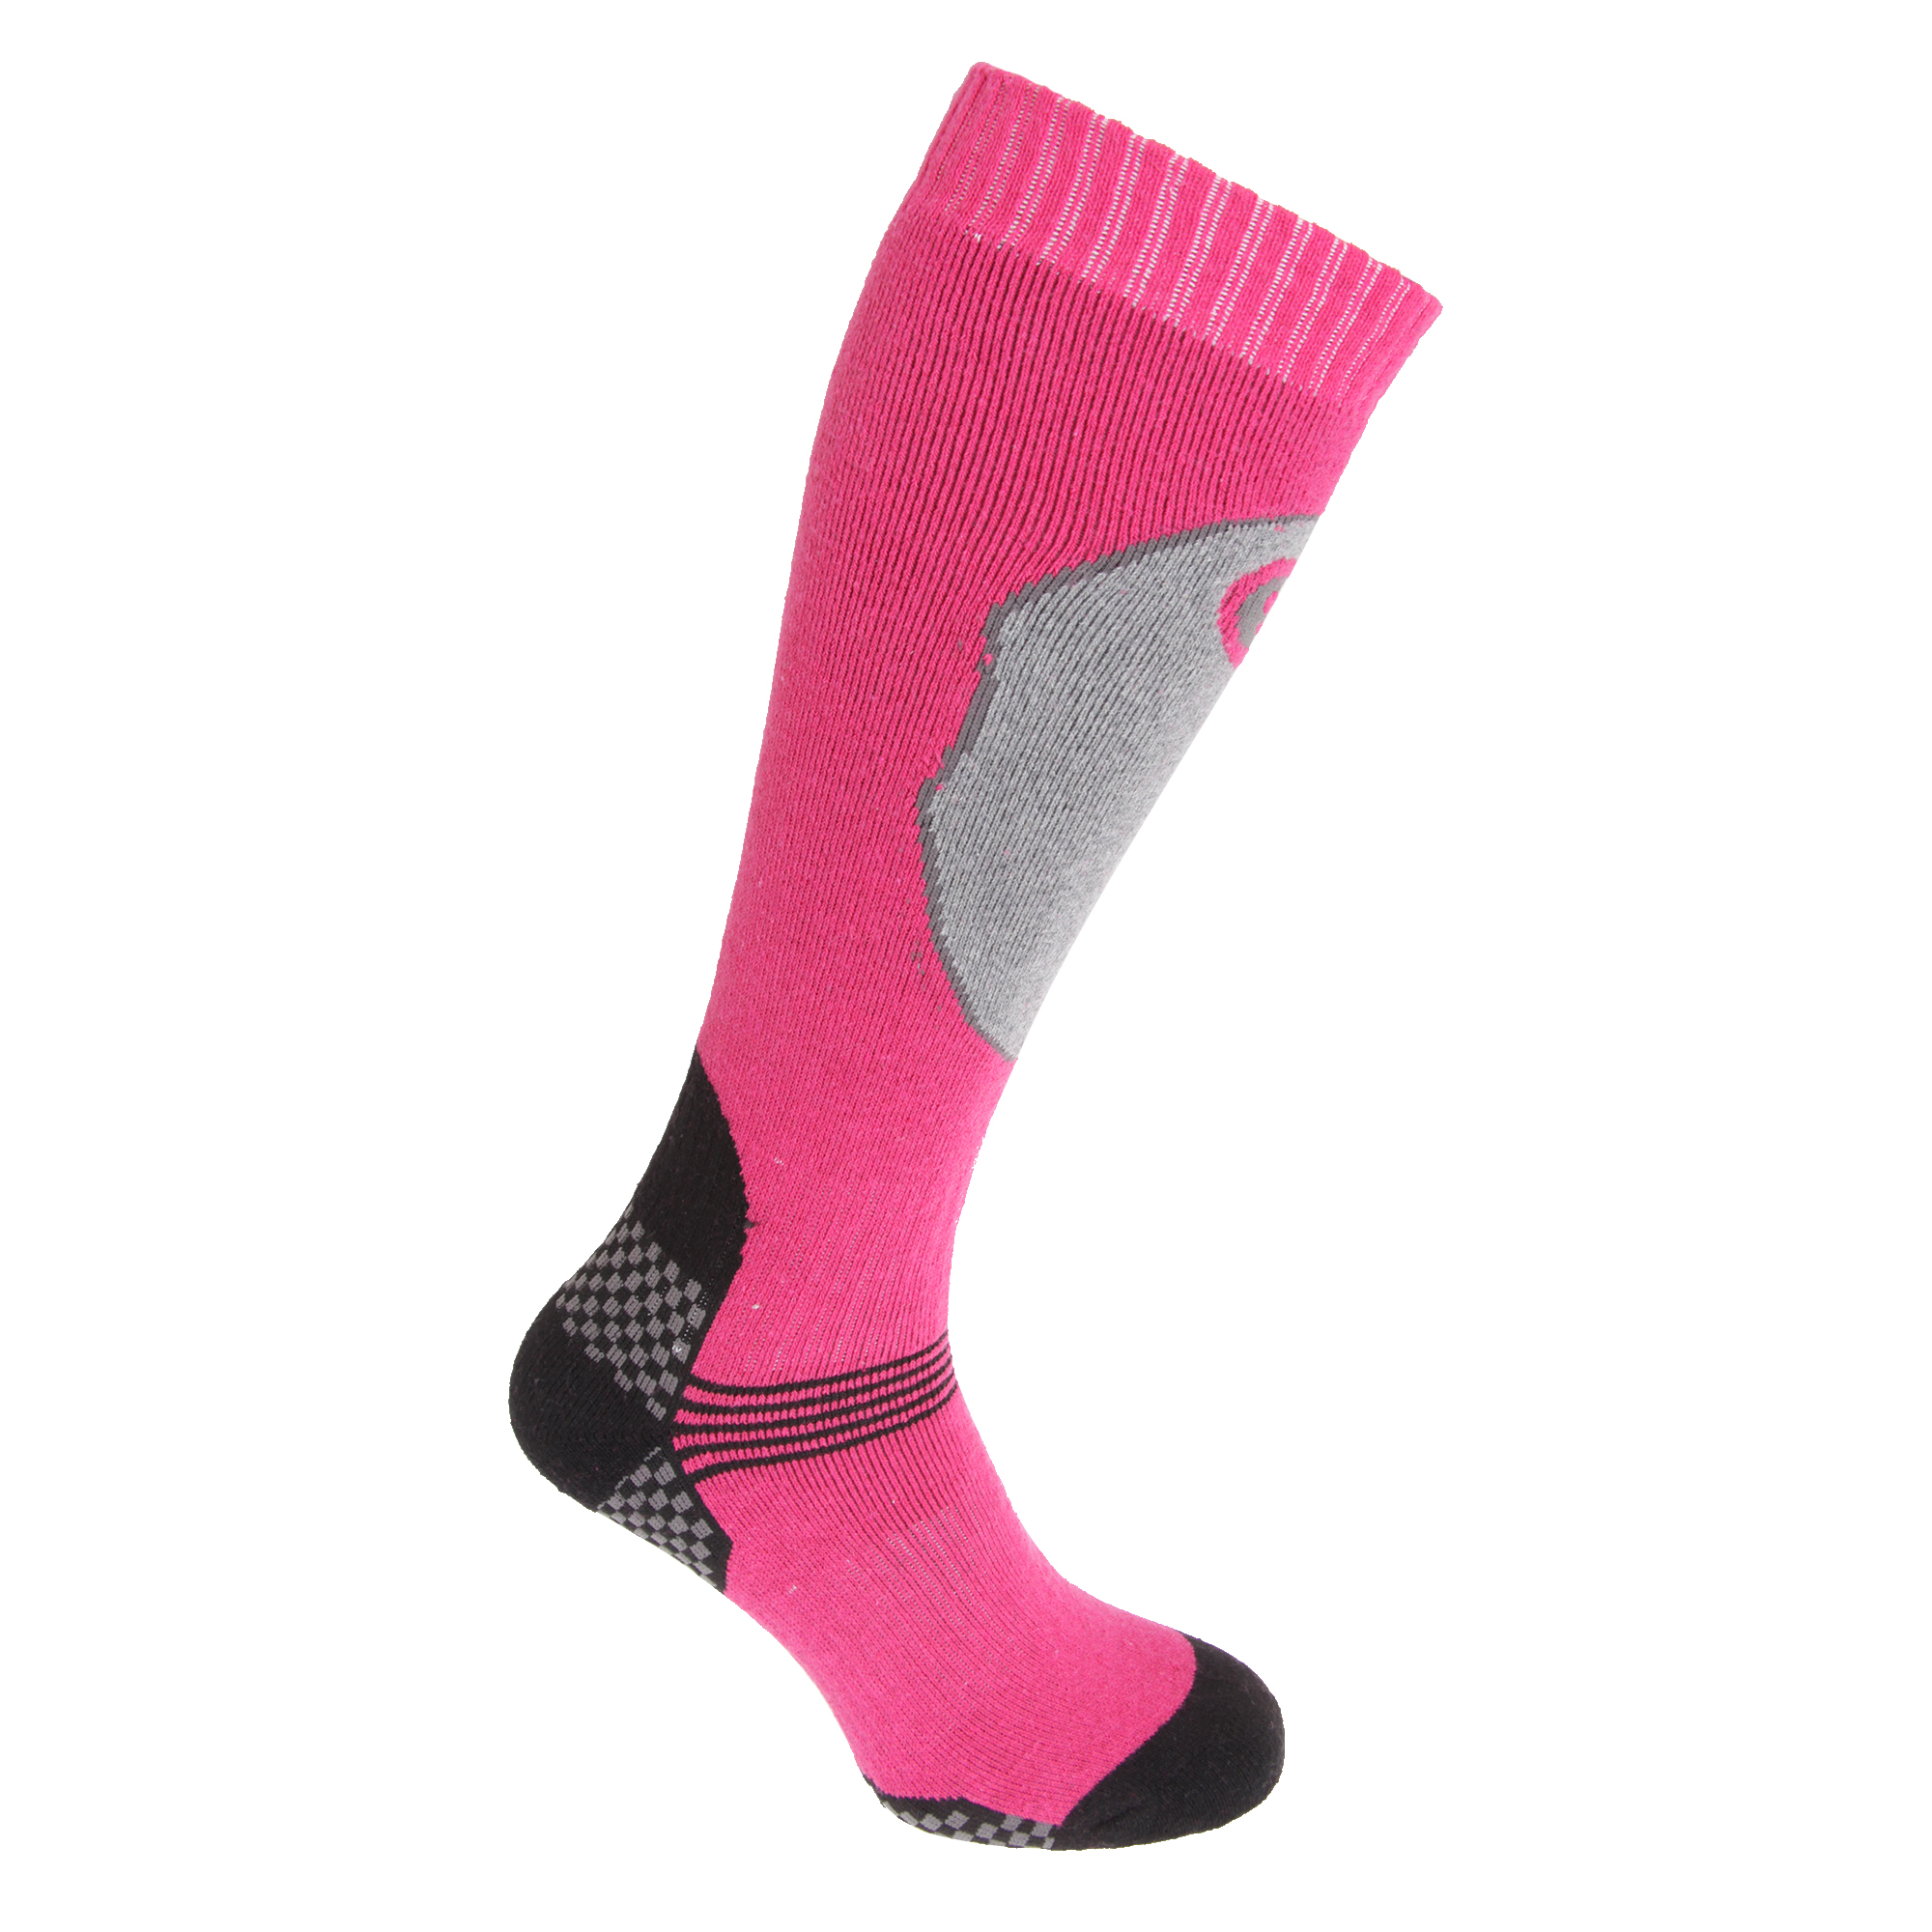 Womens-Ladies-High-Performance-Ski-Socks-1-Pair-W516